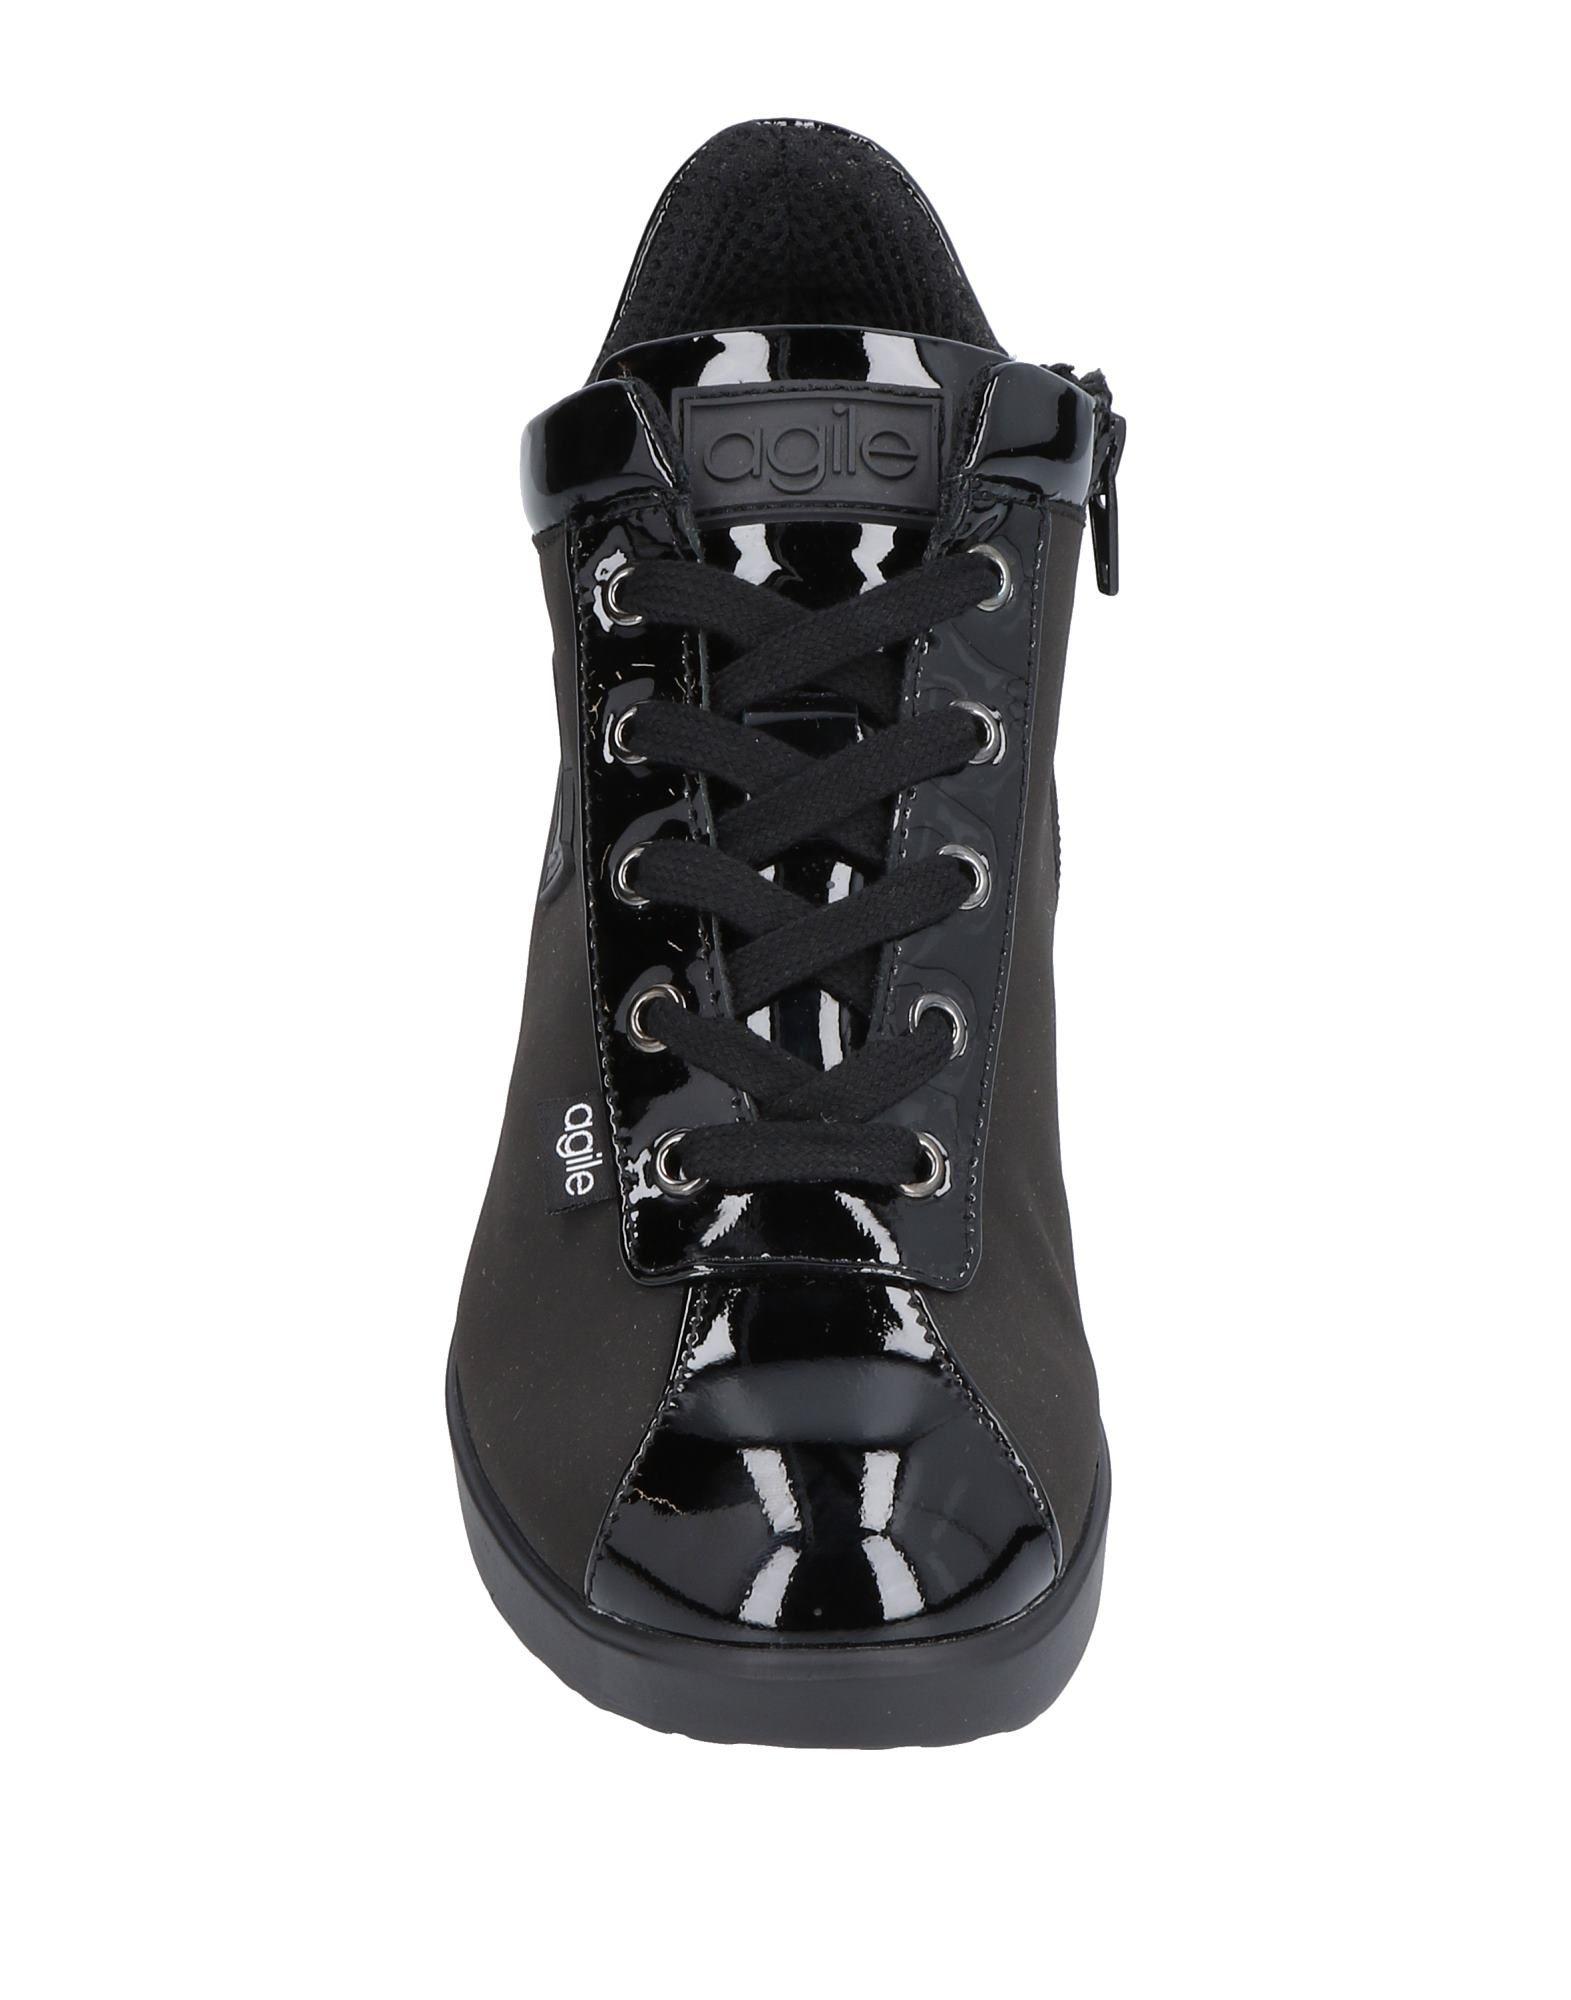 Agile By Rucoline Qualität Sneakers Damen  11496220SQ Gute Qualität Rucoline beliebte Schuhe ba1002